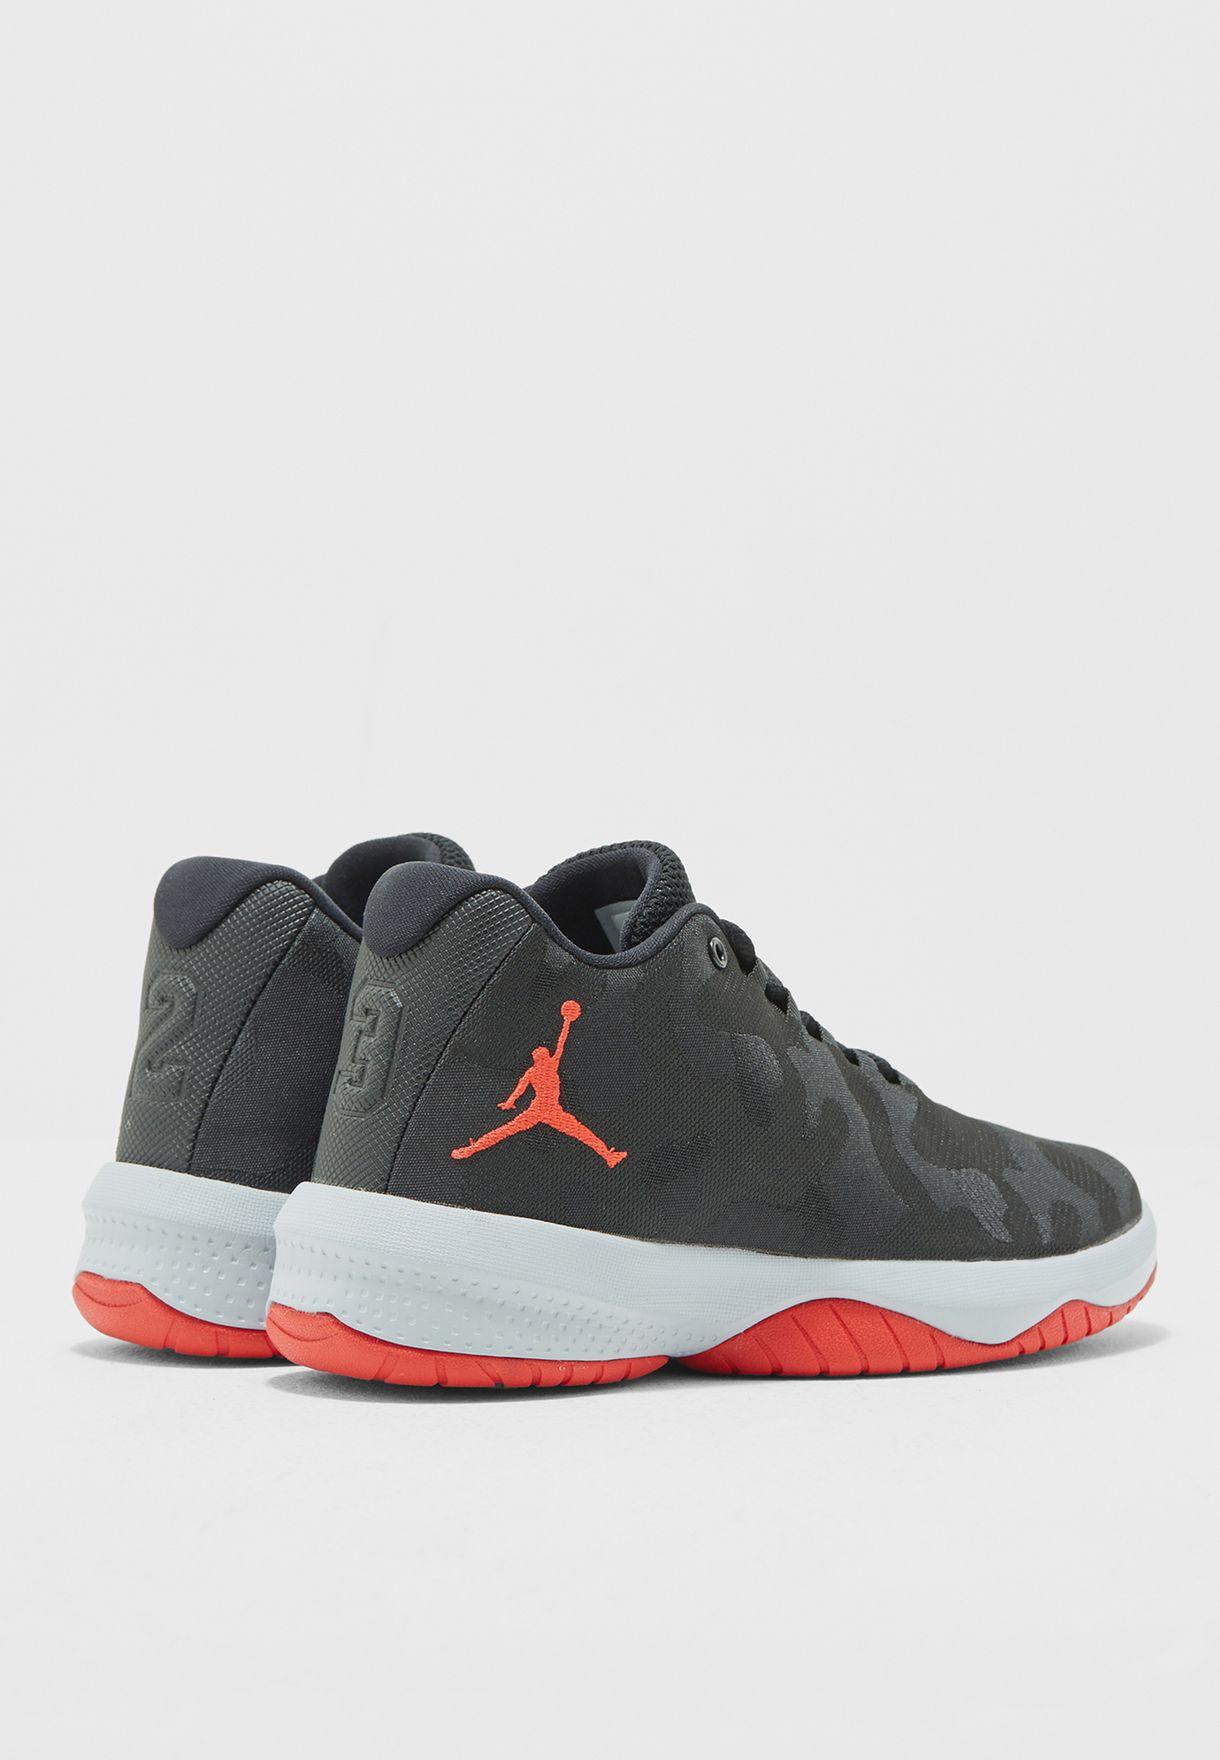 on sale 8882a 6bd61 Jordan B. Fly BG Youth